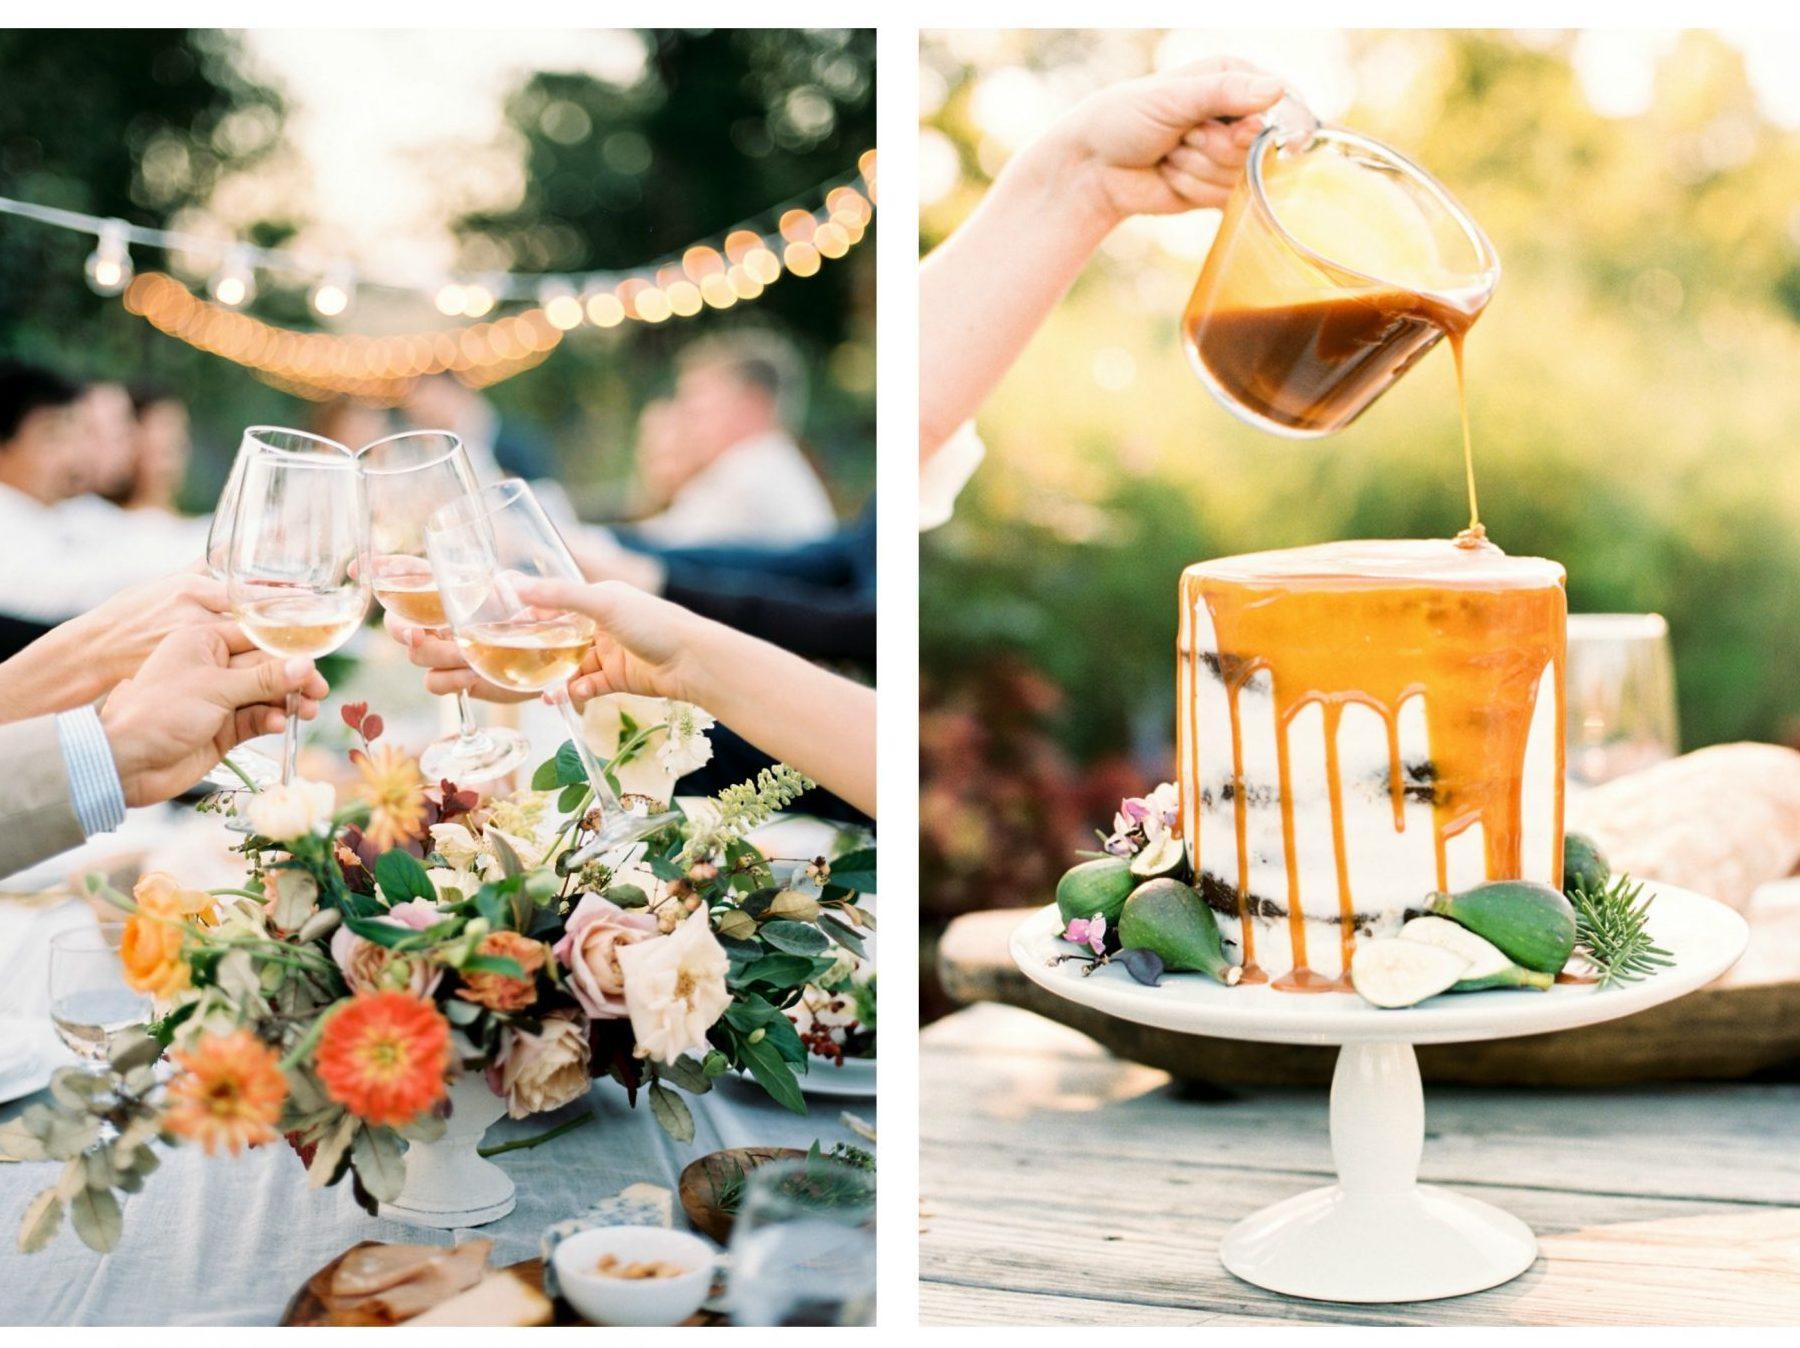 Moss Mountain Farms // Garden Style Wedding, https://erinwilsonphotography.com